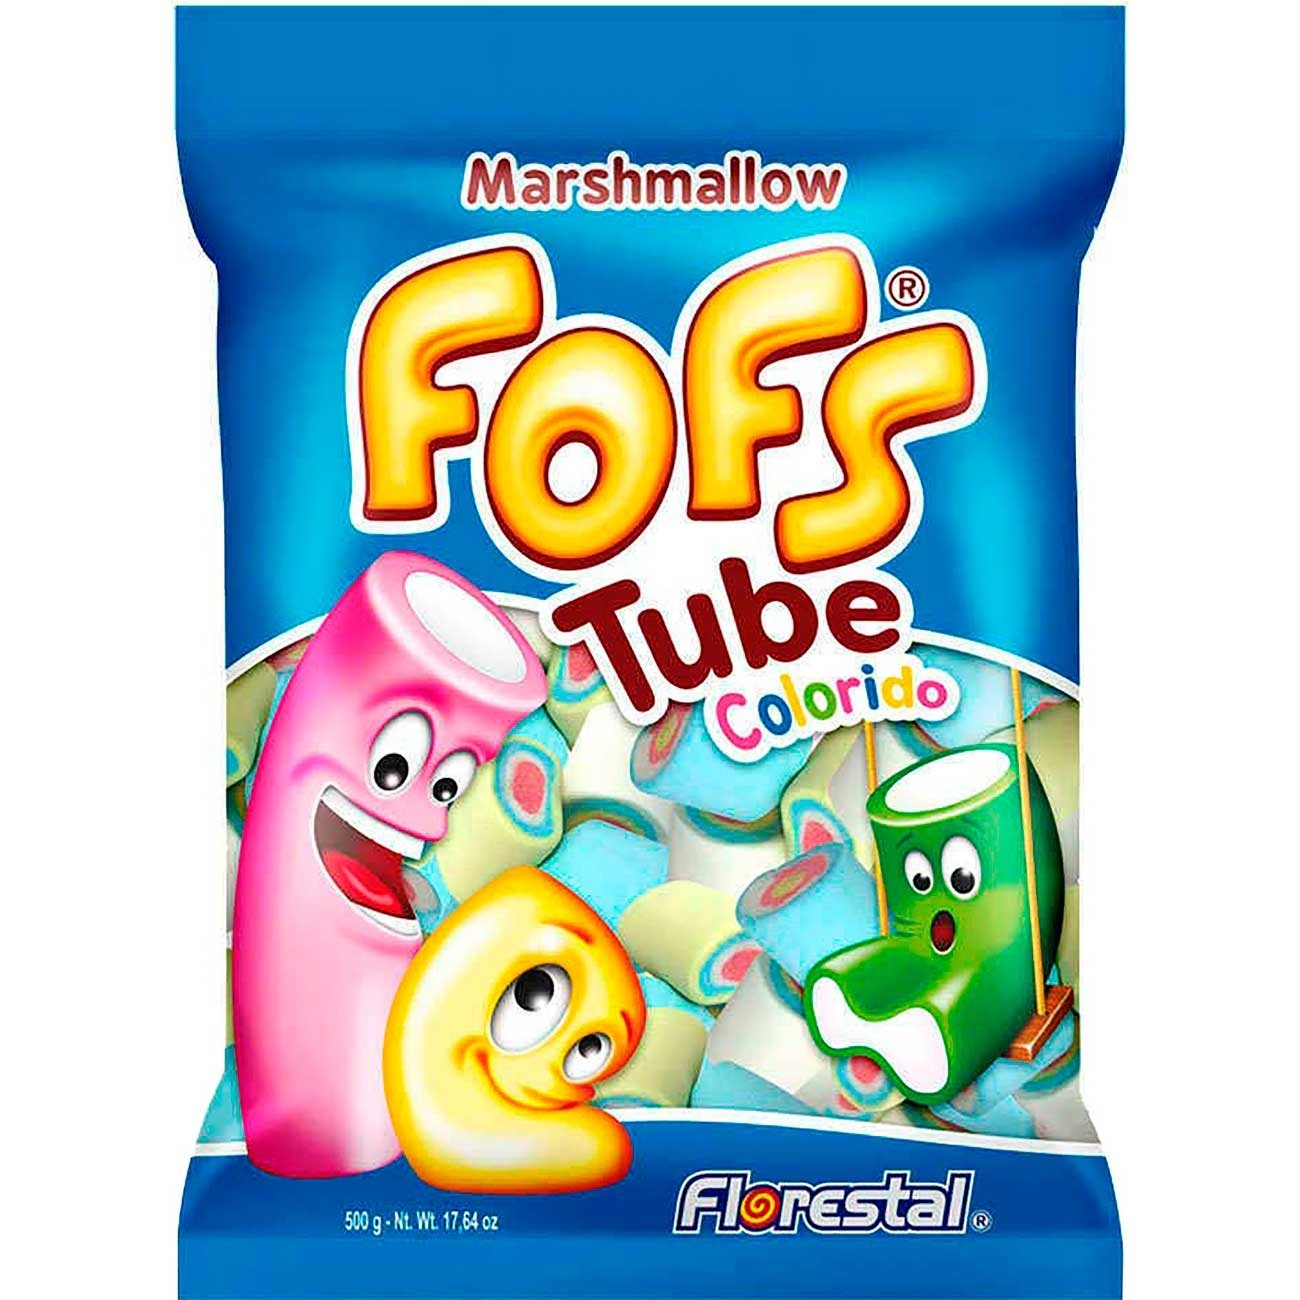 FLORESTAL - MARSHMALLOW FOFS 220G TUBE COLOR